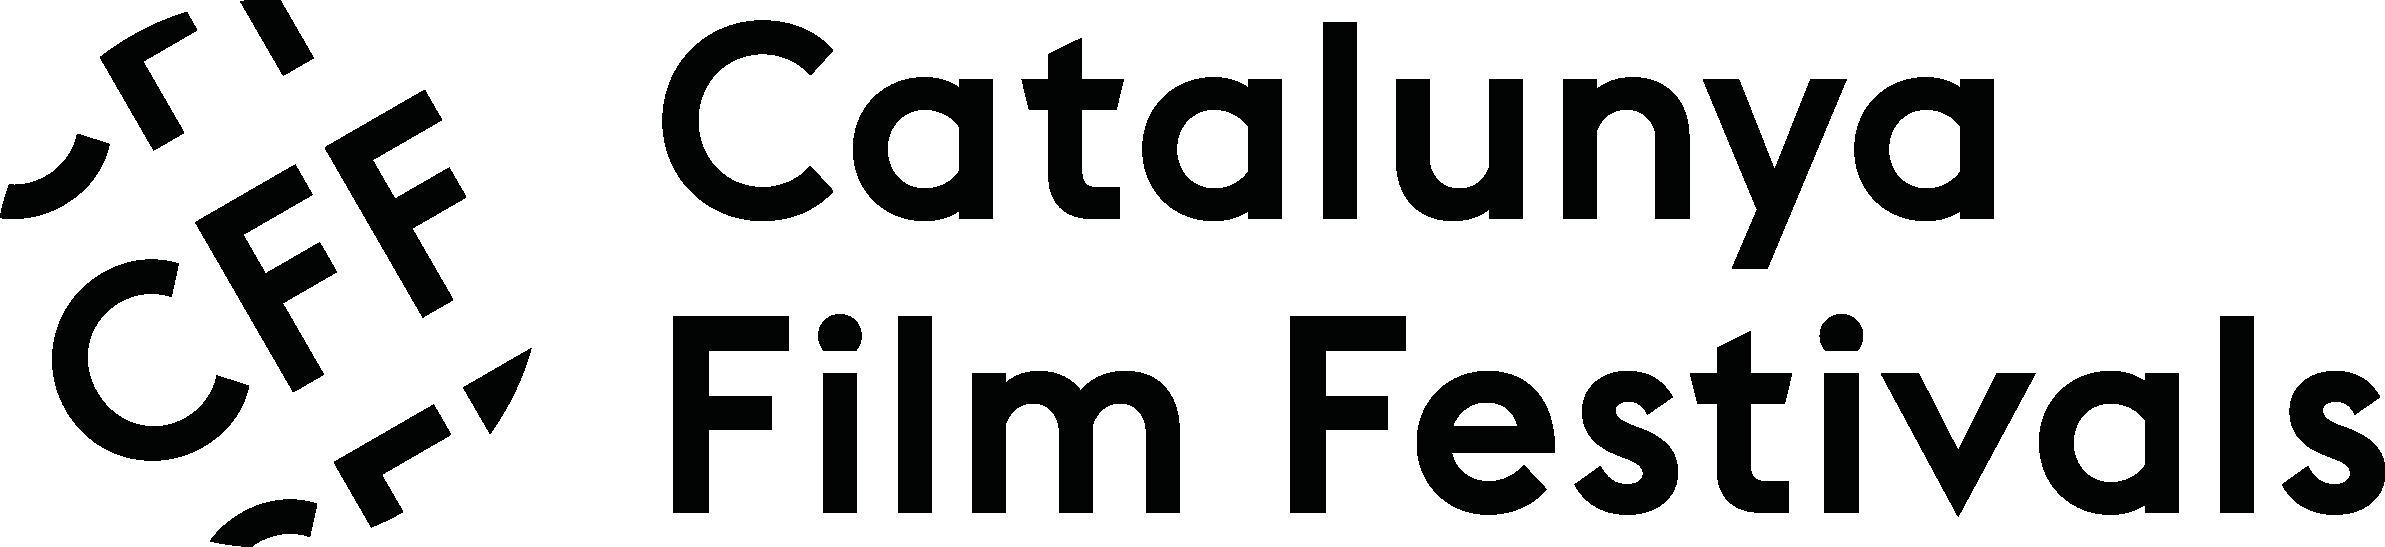 Catalunya Film Festivals